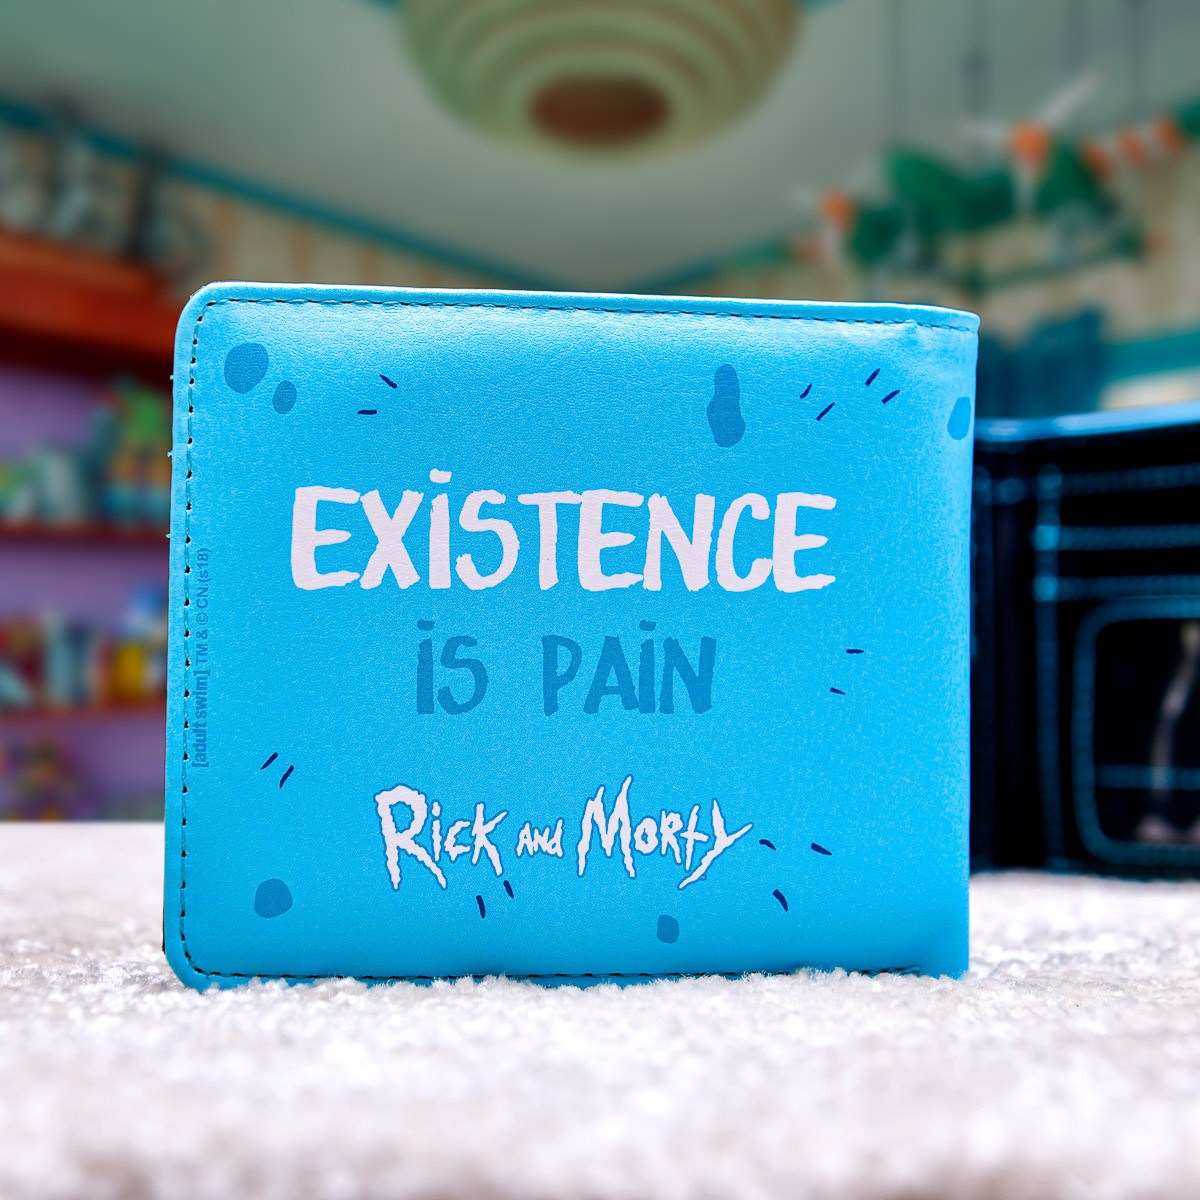 Rick & Morty Kidboxeo